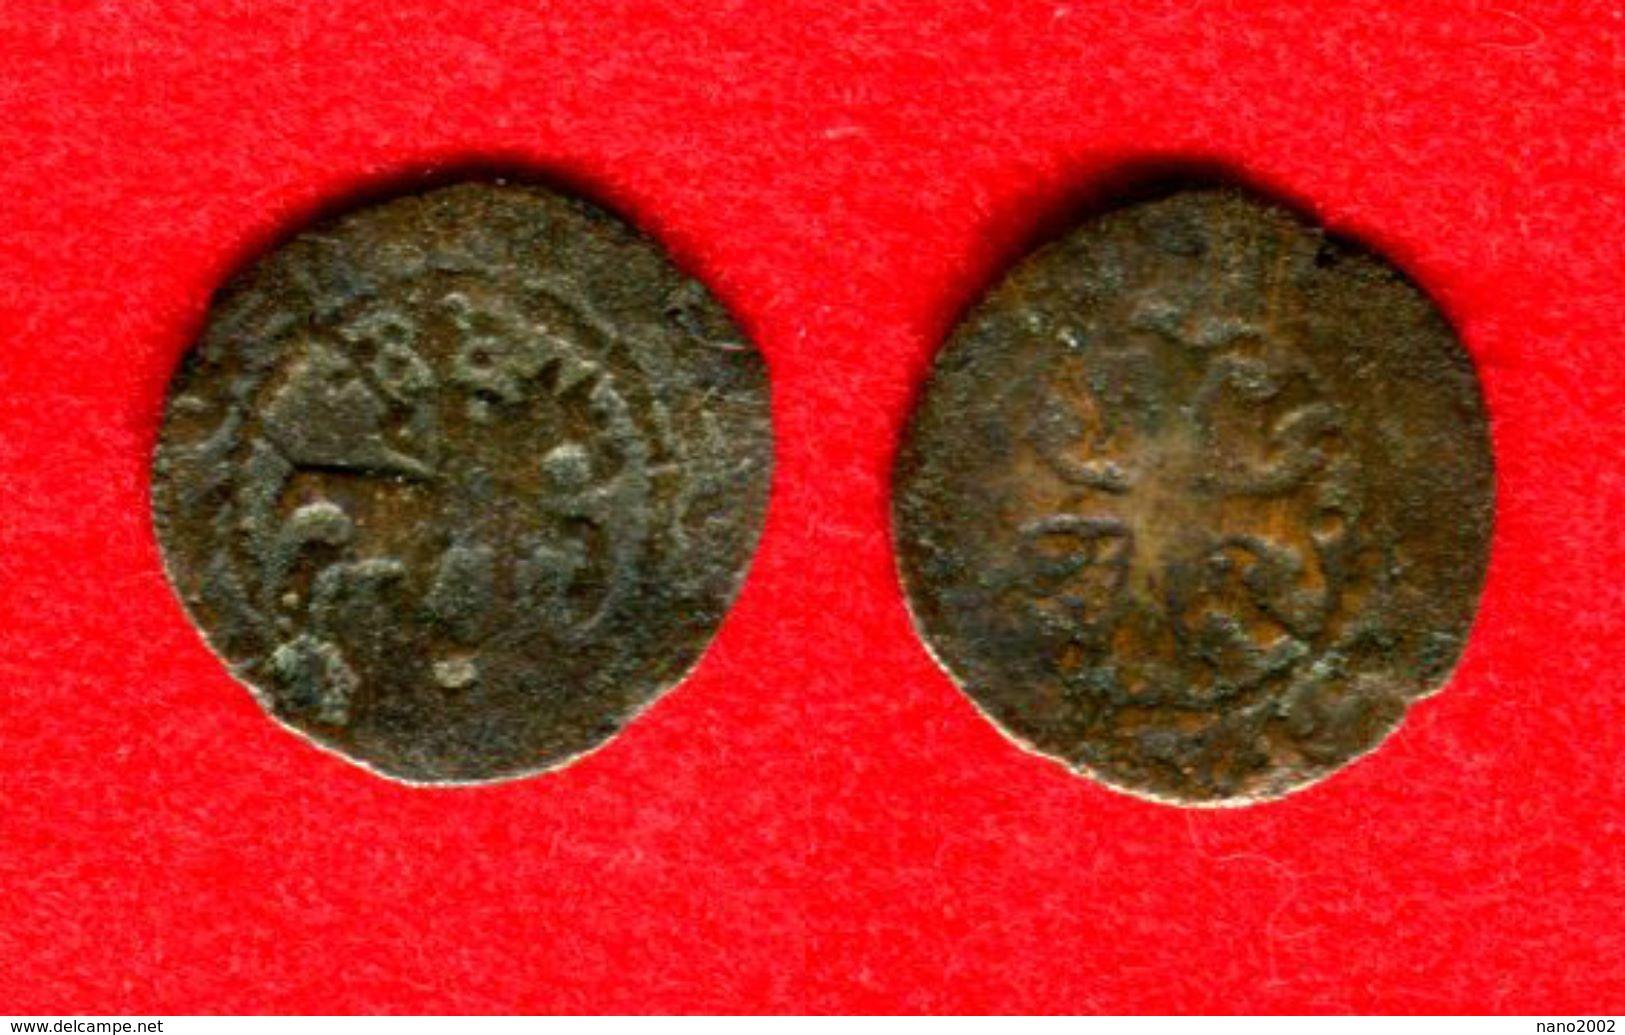 ARMENIE - ARMENIA - ARMÄNIEN -  SMPAD 1297-1299 POGH DE BRONZE - PAS COURANT - Arménie